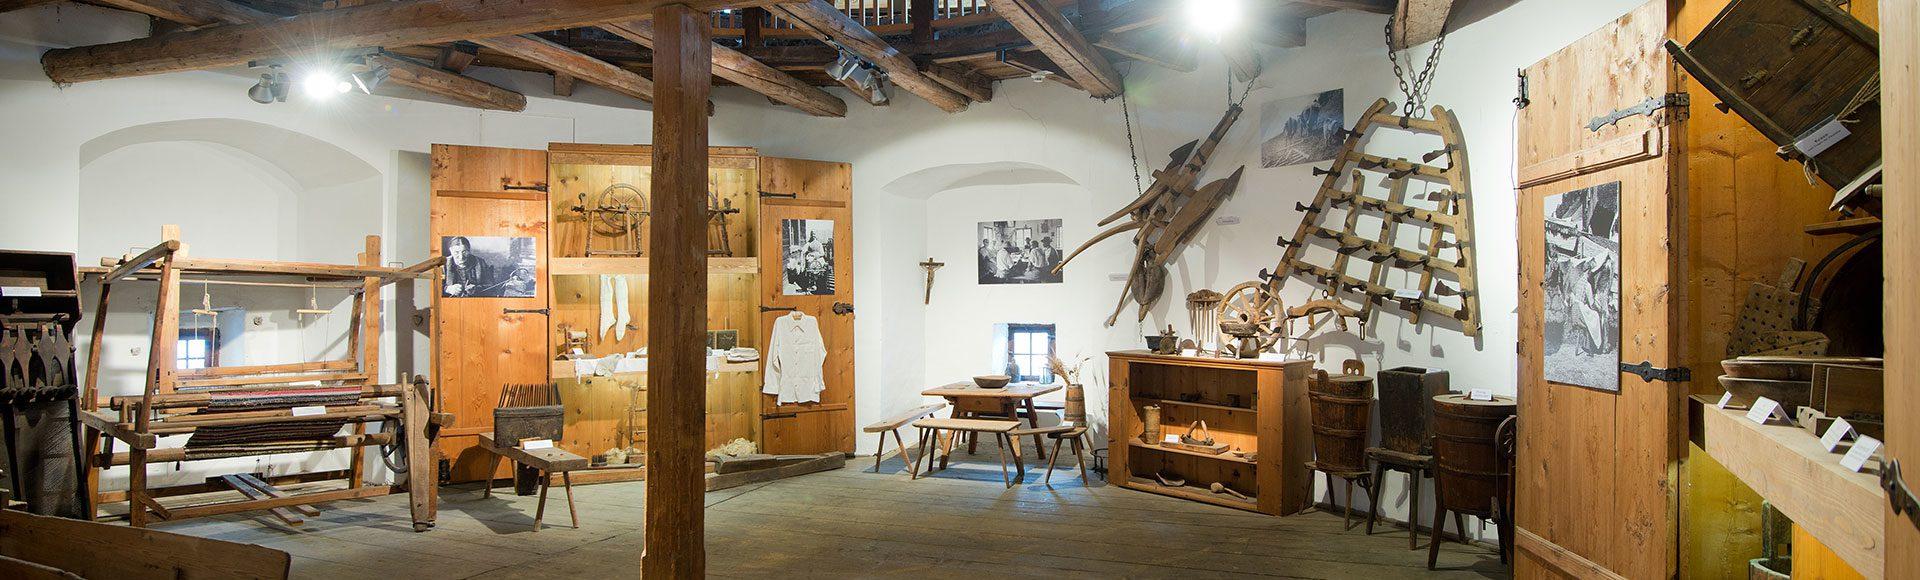 Museum Radstadt Radstädter Museumsverein Thomas Stiegler 2